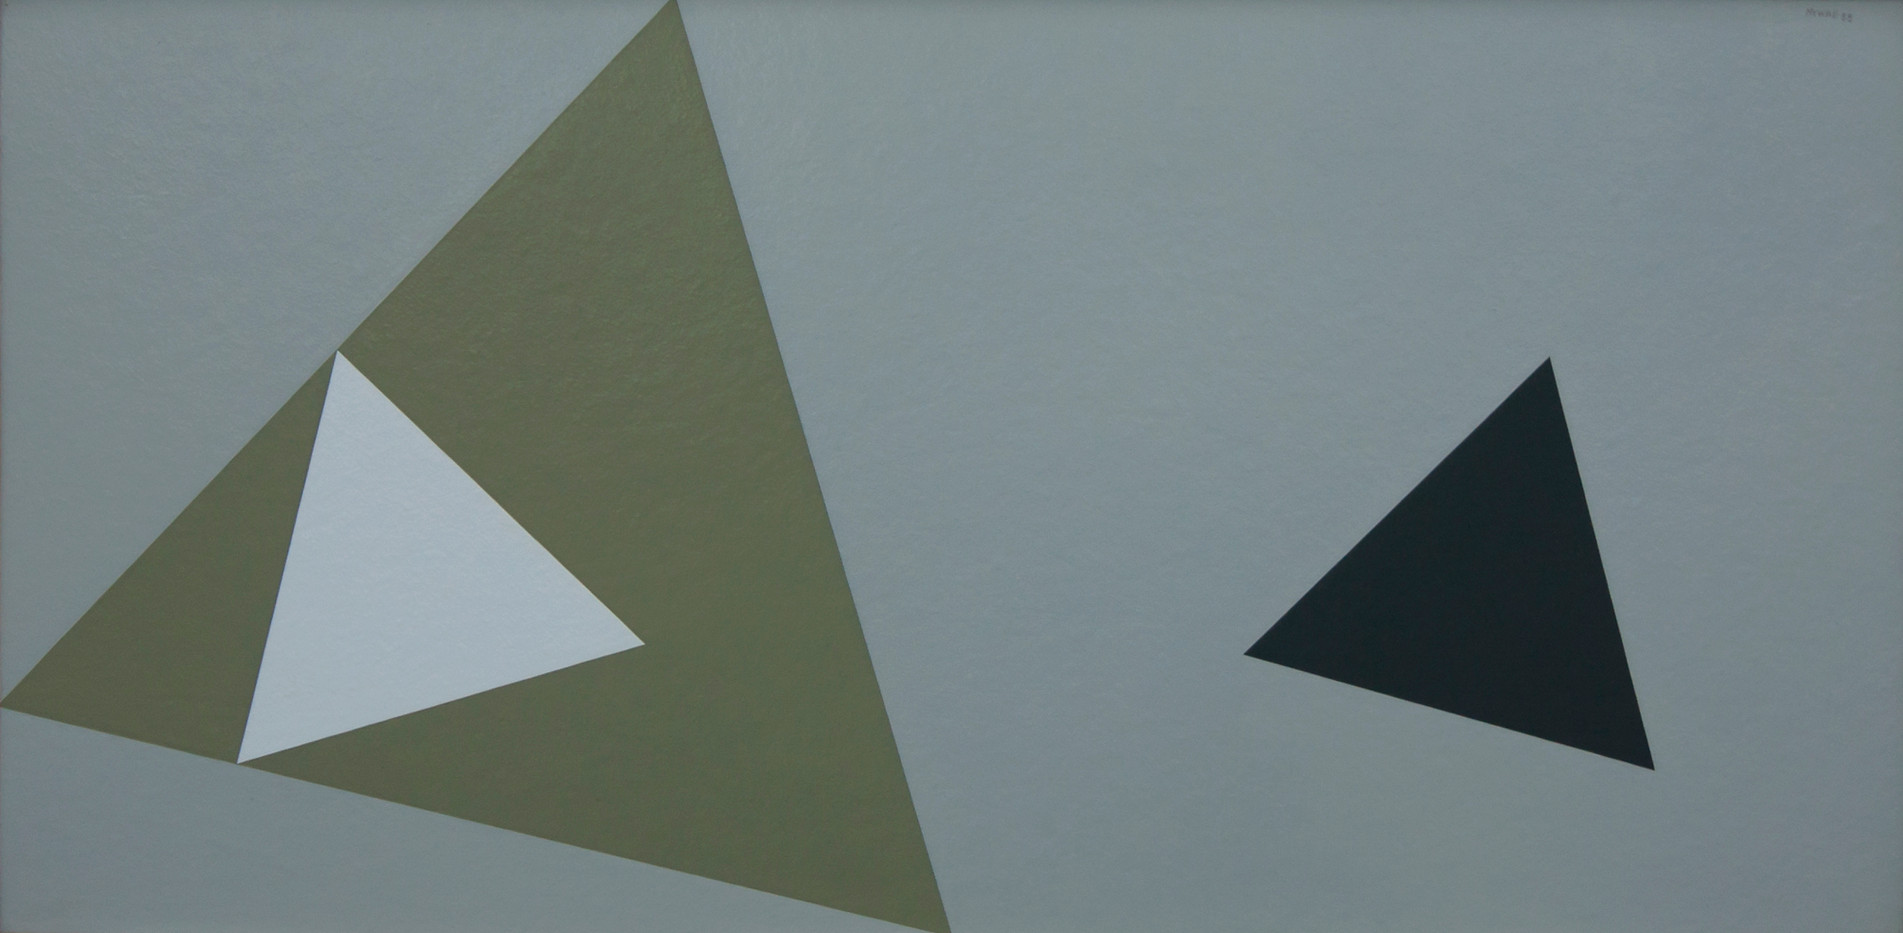 Albert Newall | Untitled | 1958 | Acrylic on Board | 44.5 x 90.5 cm